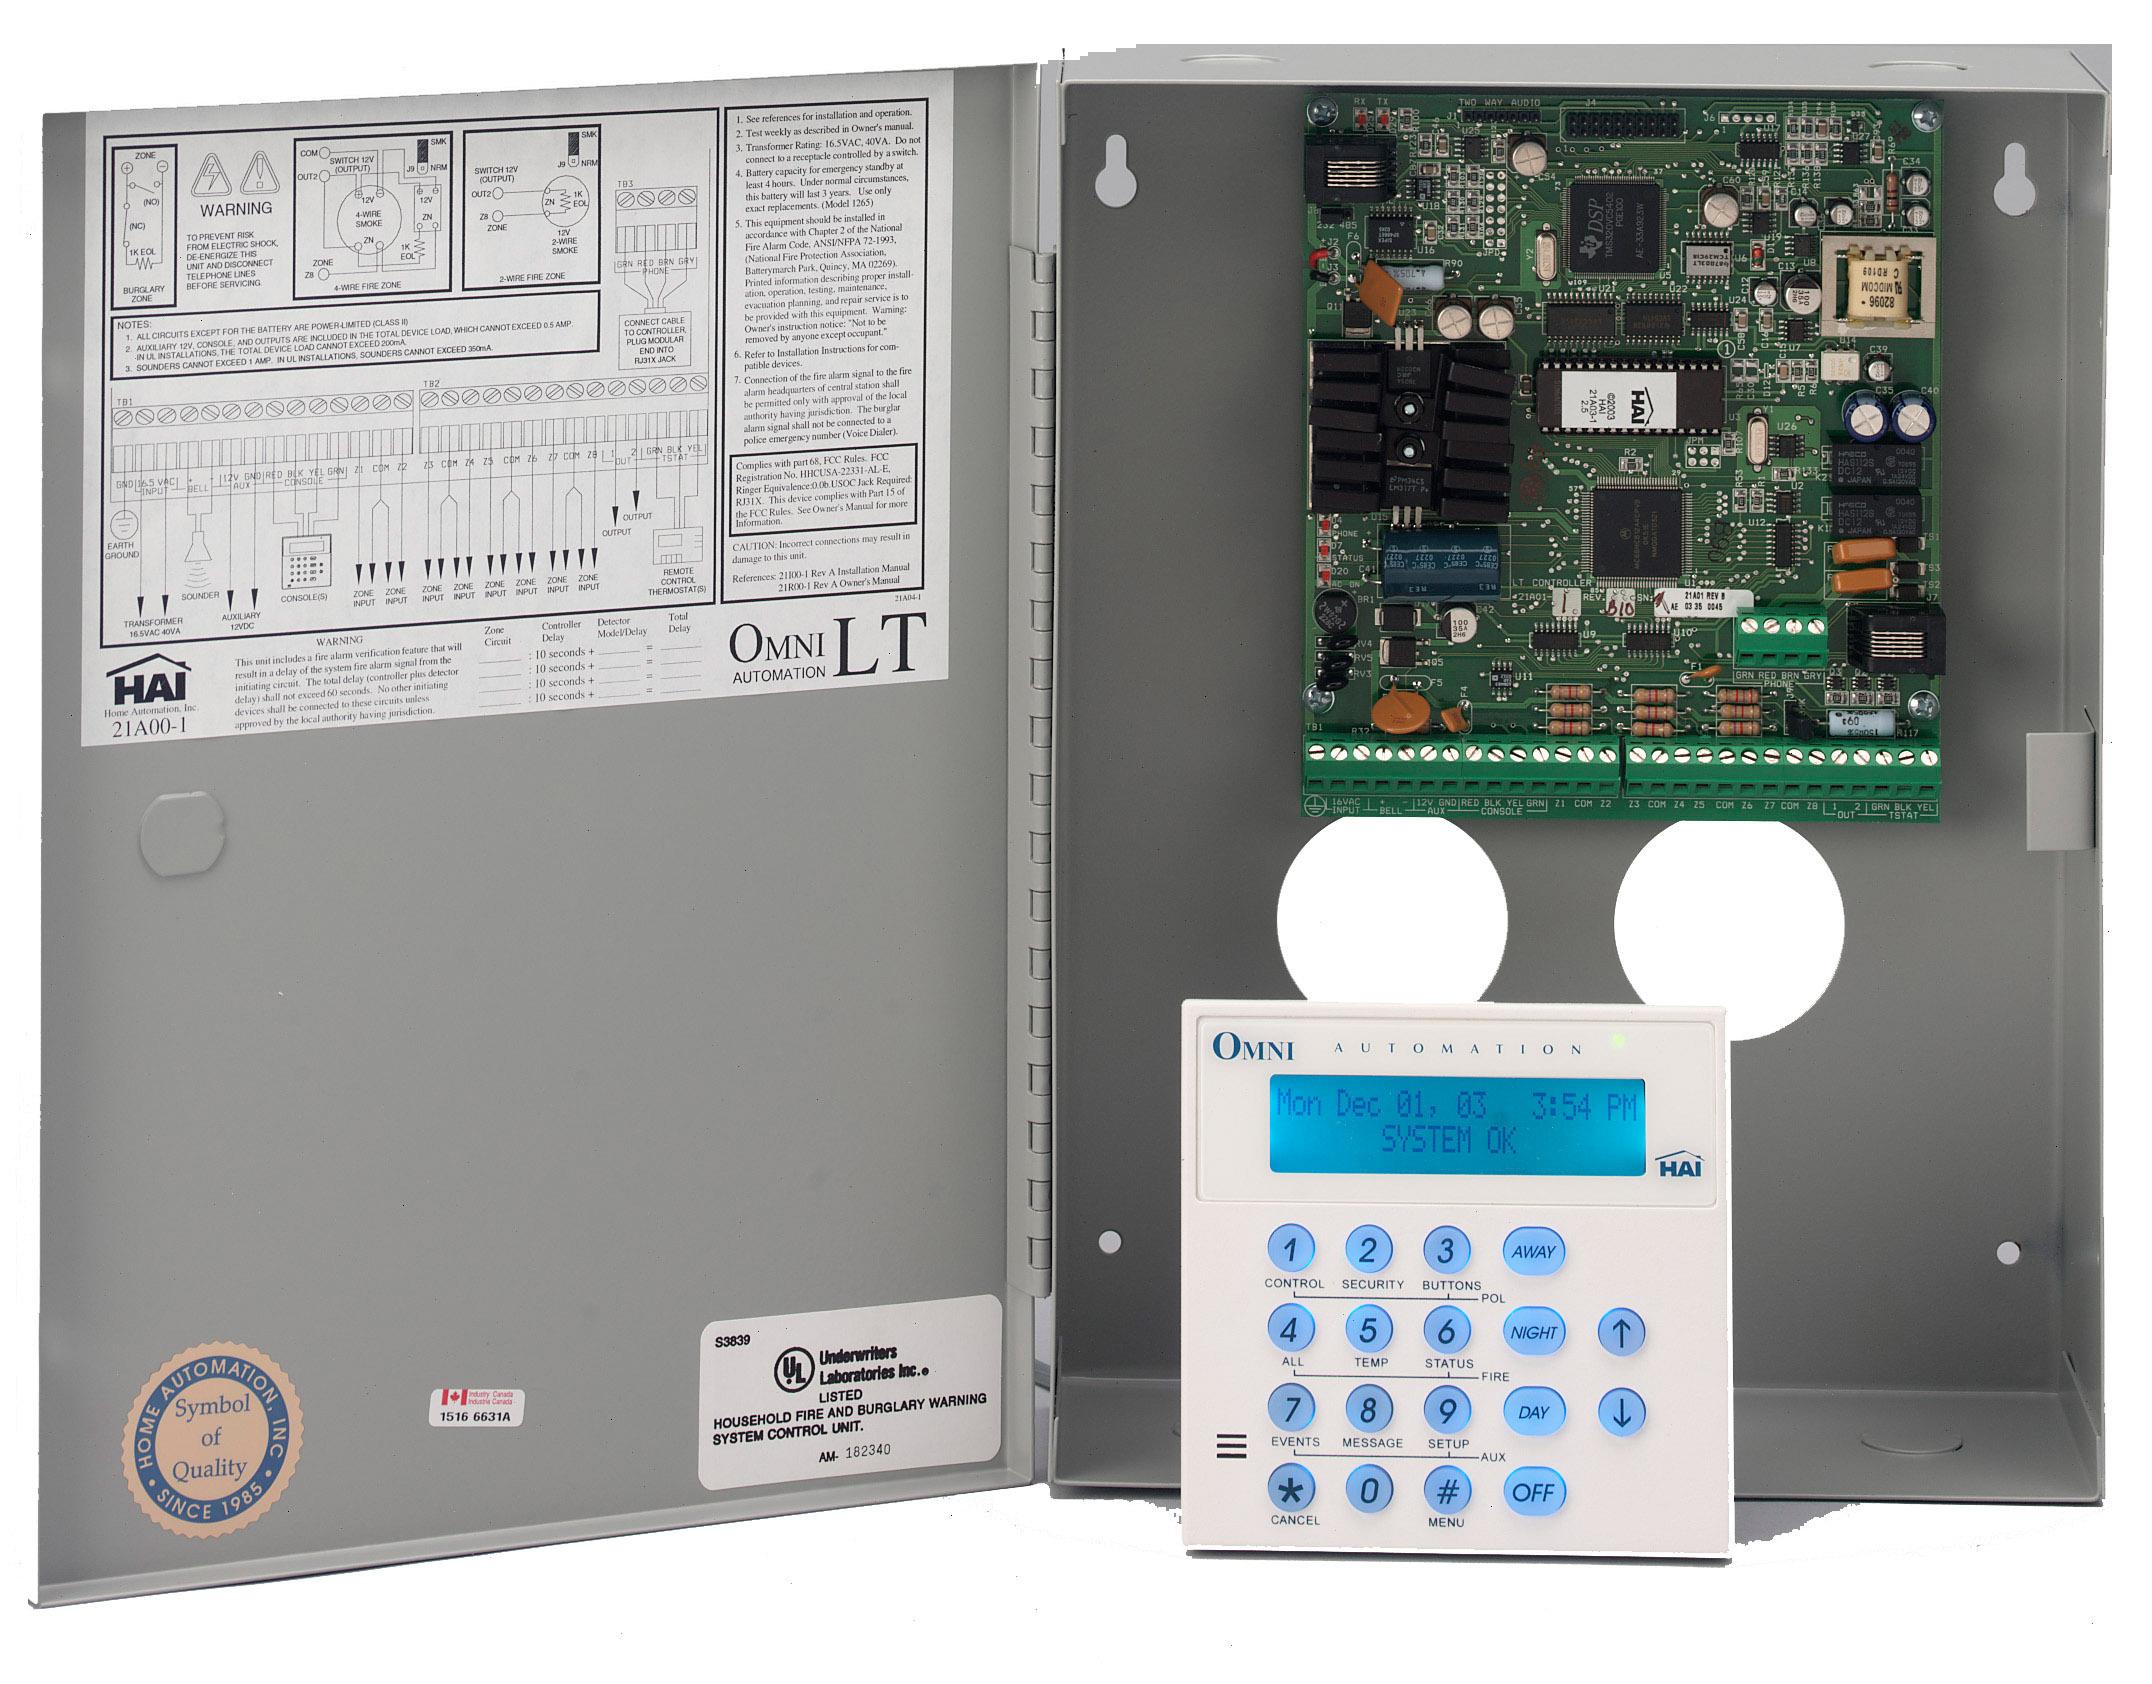 Omni LT open 03 sirkom 21a00 1 omni lt controller hai omnistat wiring diagram at reclaimingppi.co